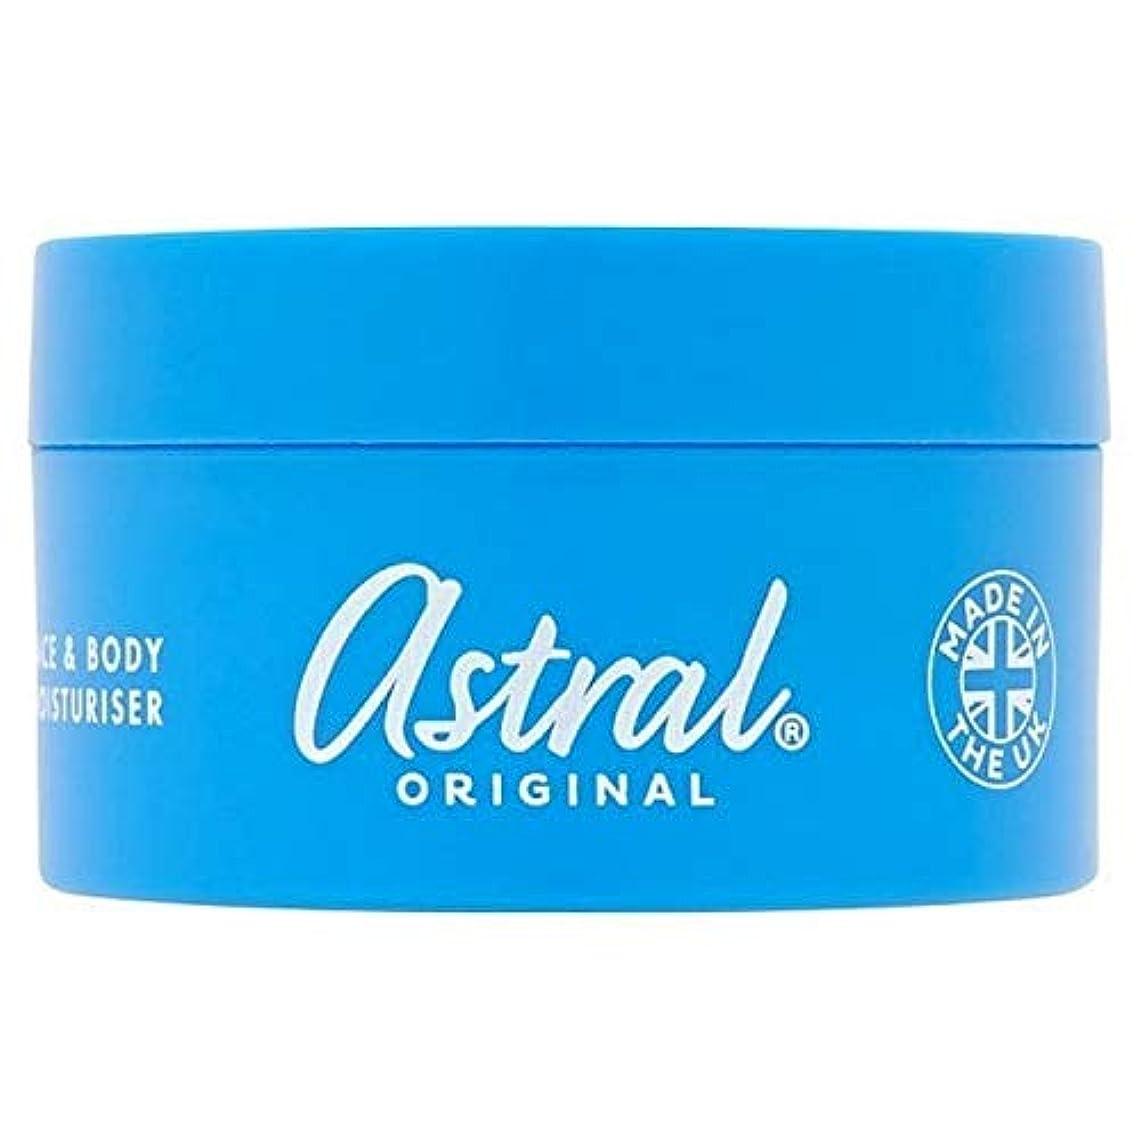 [Astral ] すべての保湿50ミリリットルを超えるオリジナルアストラル - Astral Original All Over Moisturiser 50ml [並行輸入品]